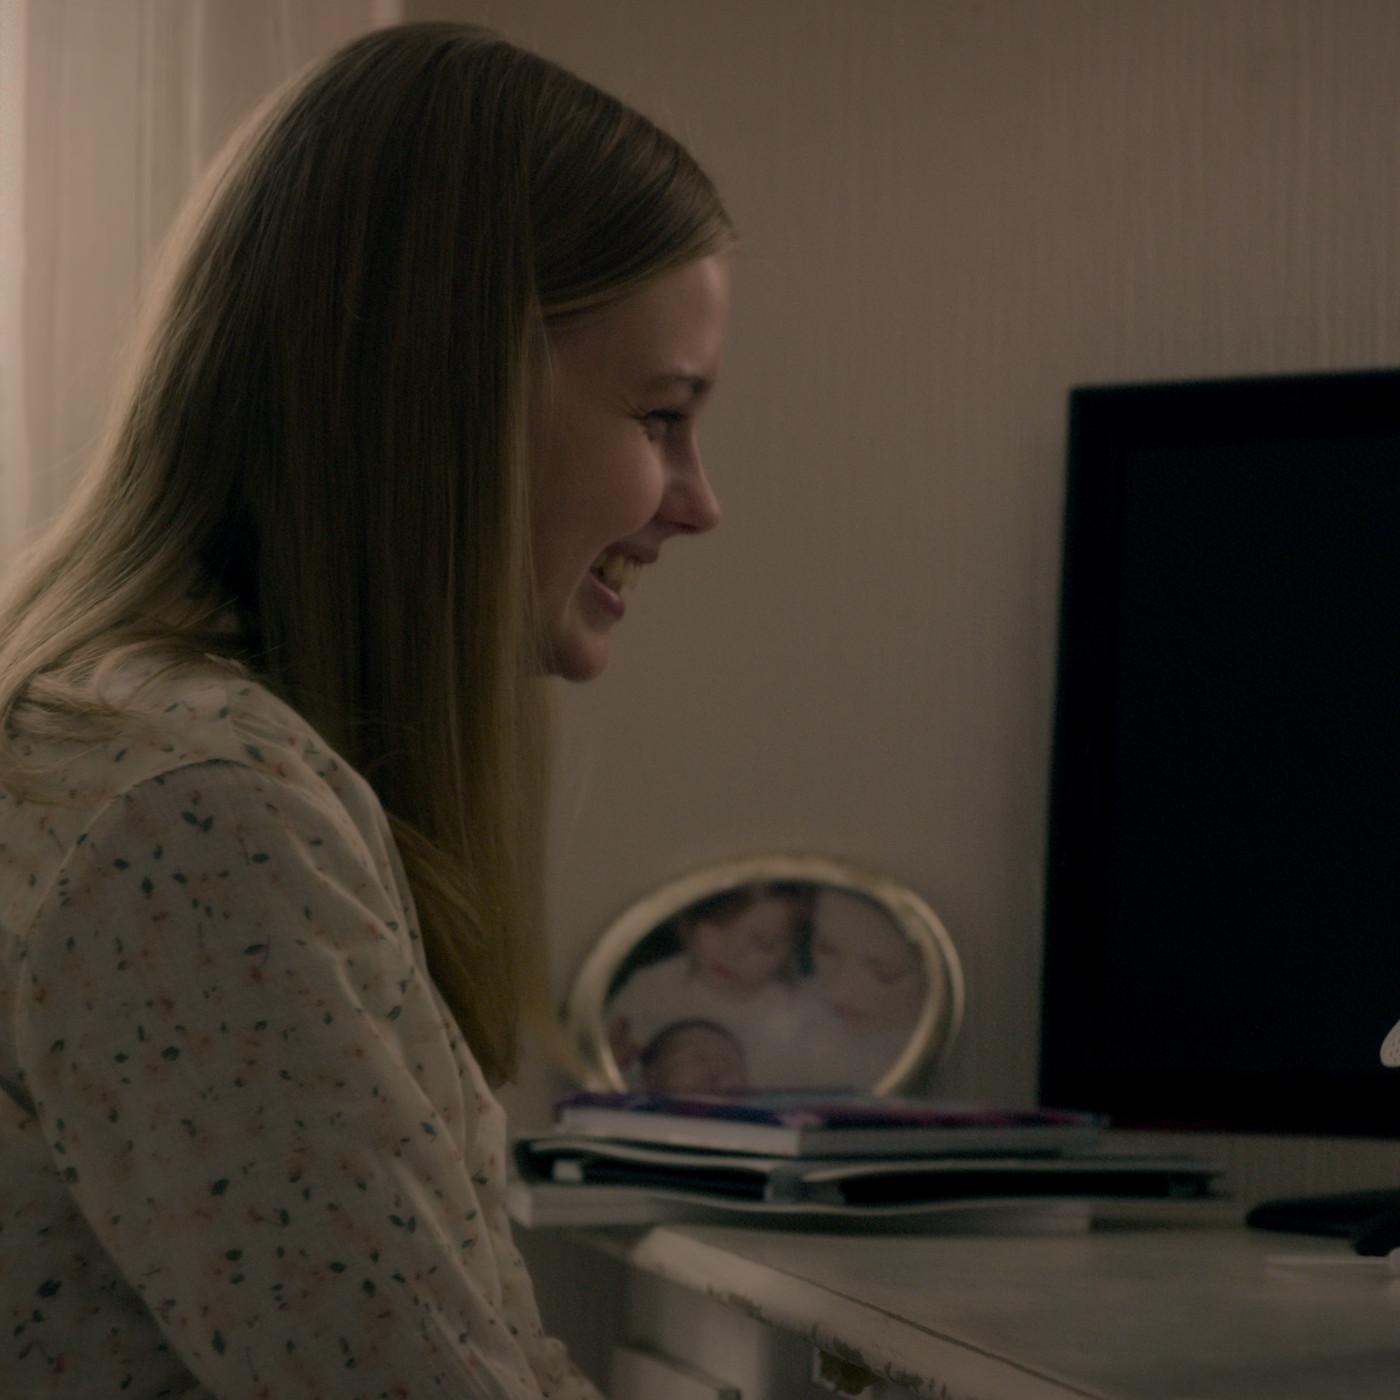 Rachel jack and ashley black mirror